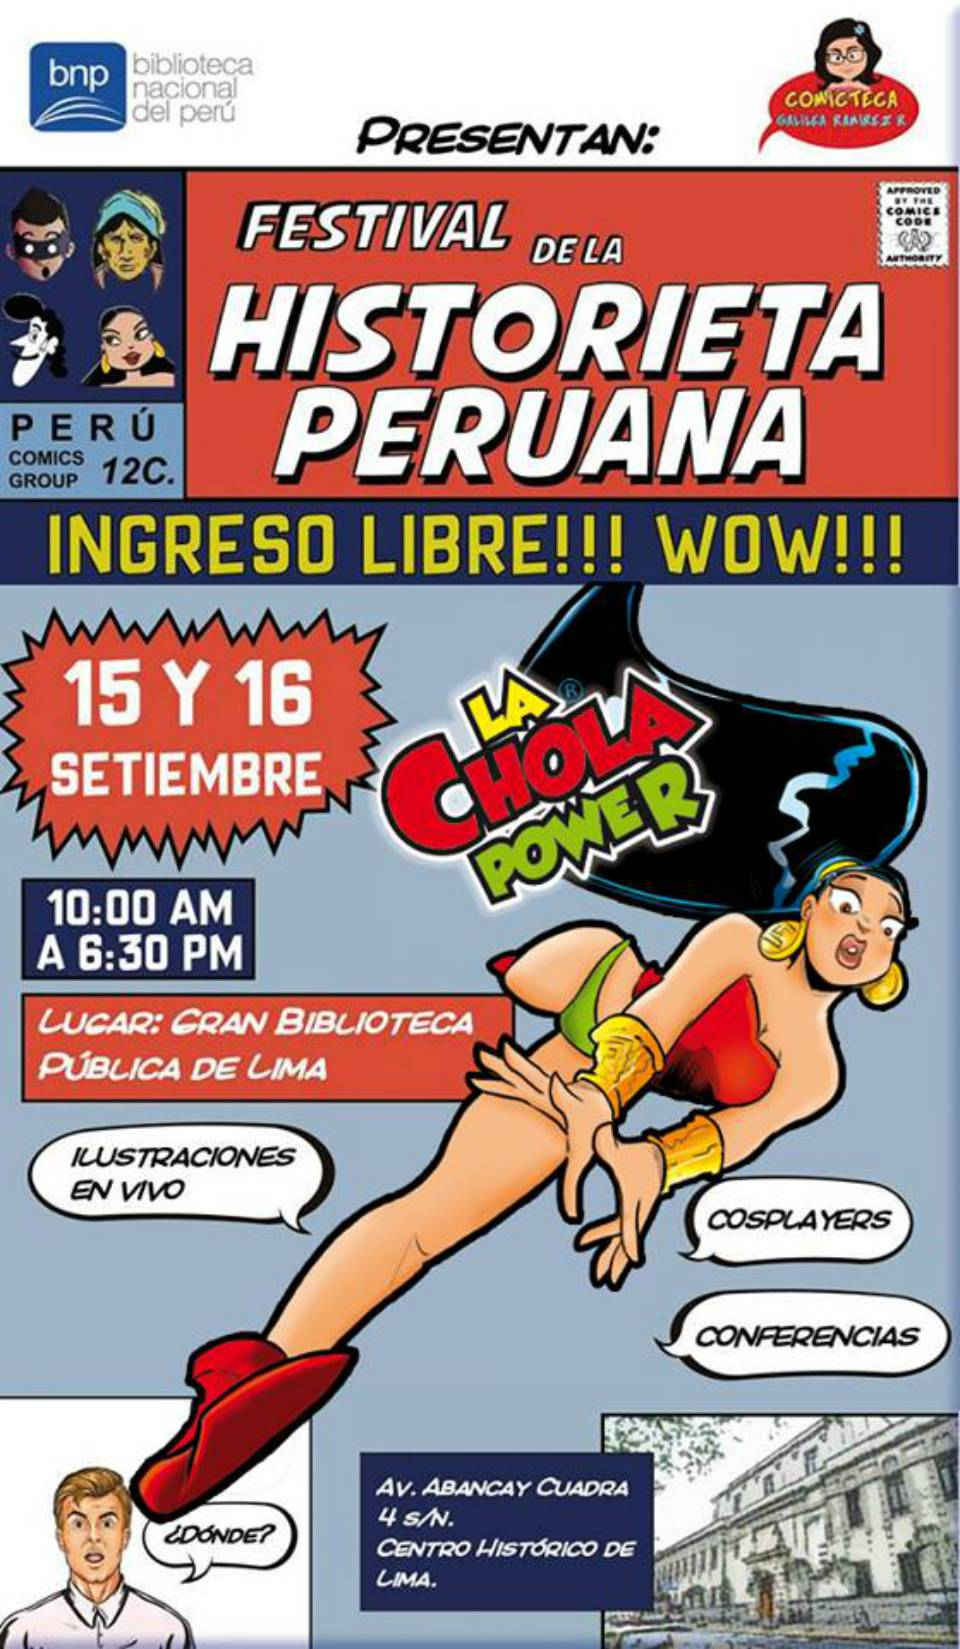 Festival de la Historieta Peruana